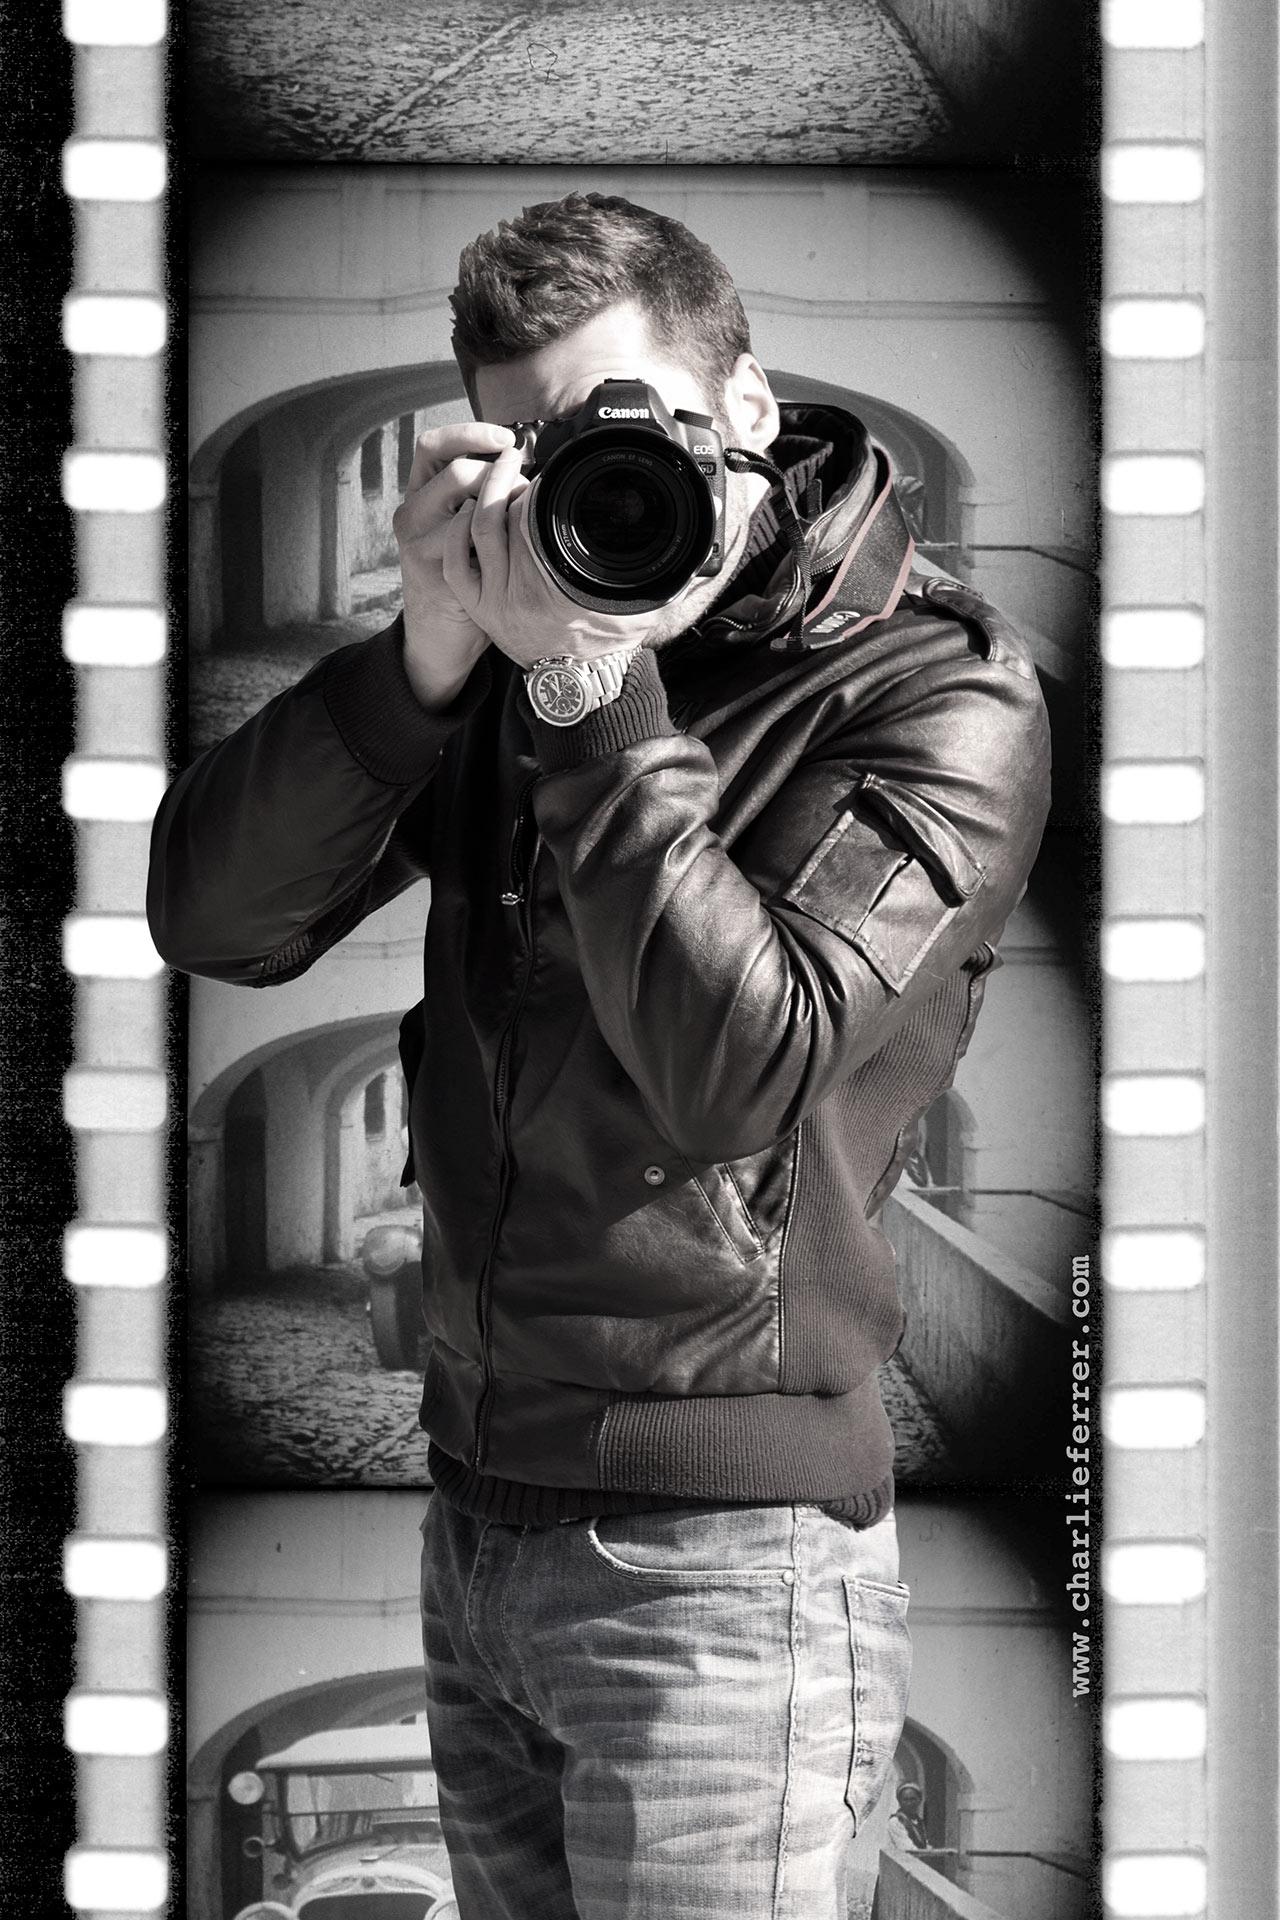 charlie_ferrer_fotografia_madrid_commercial_publicidad